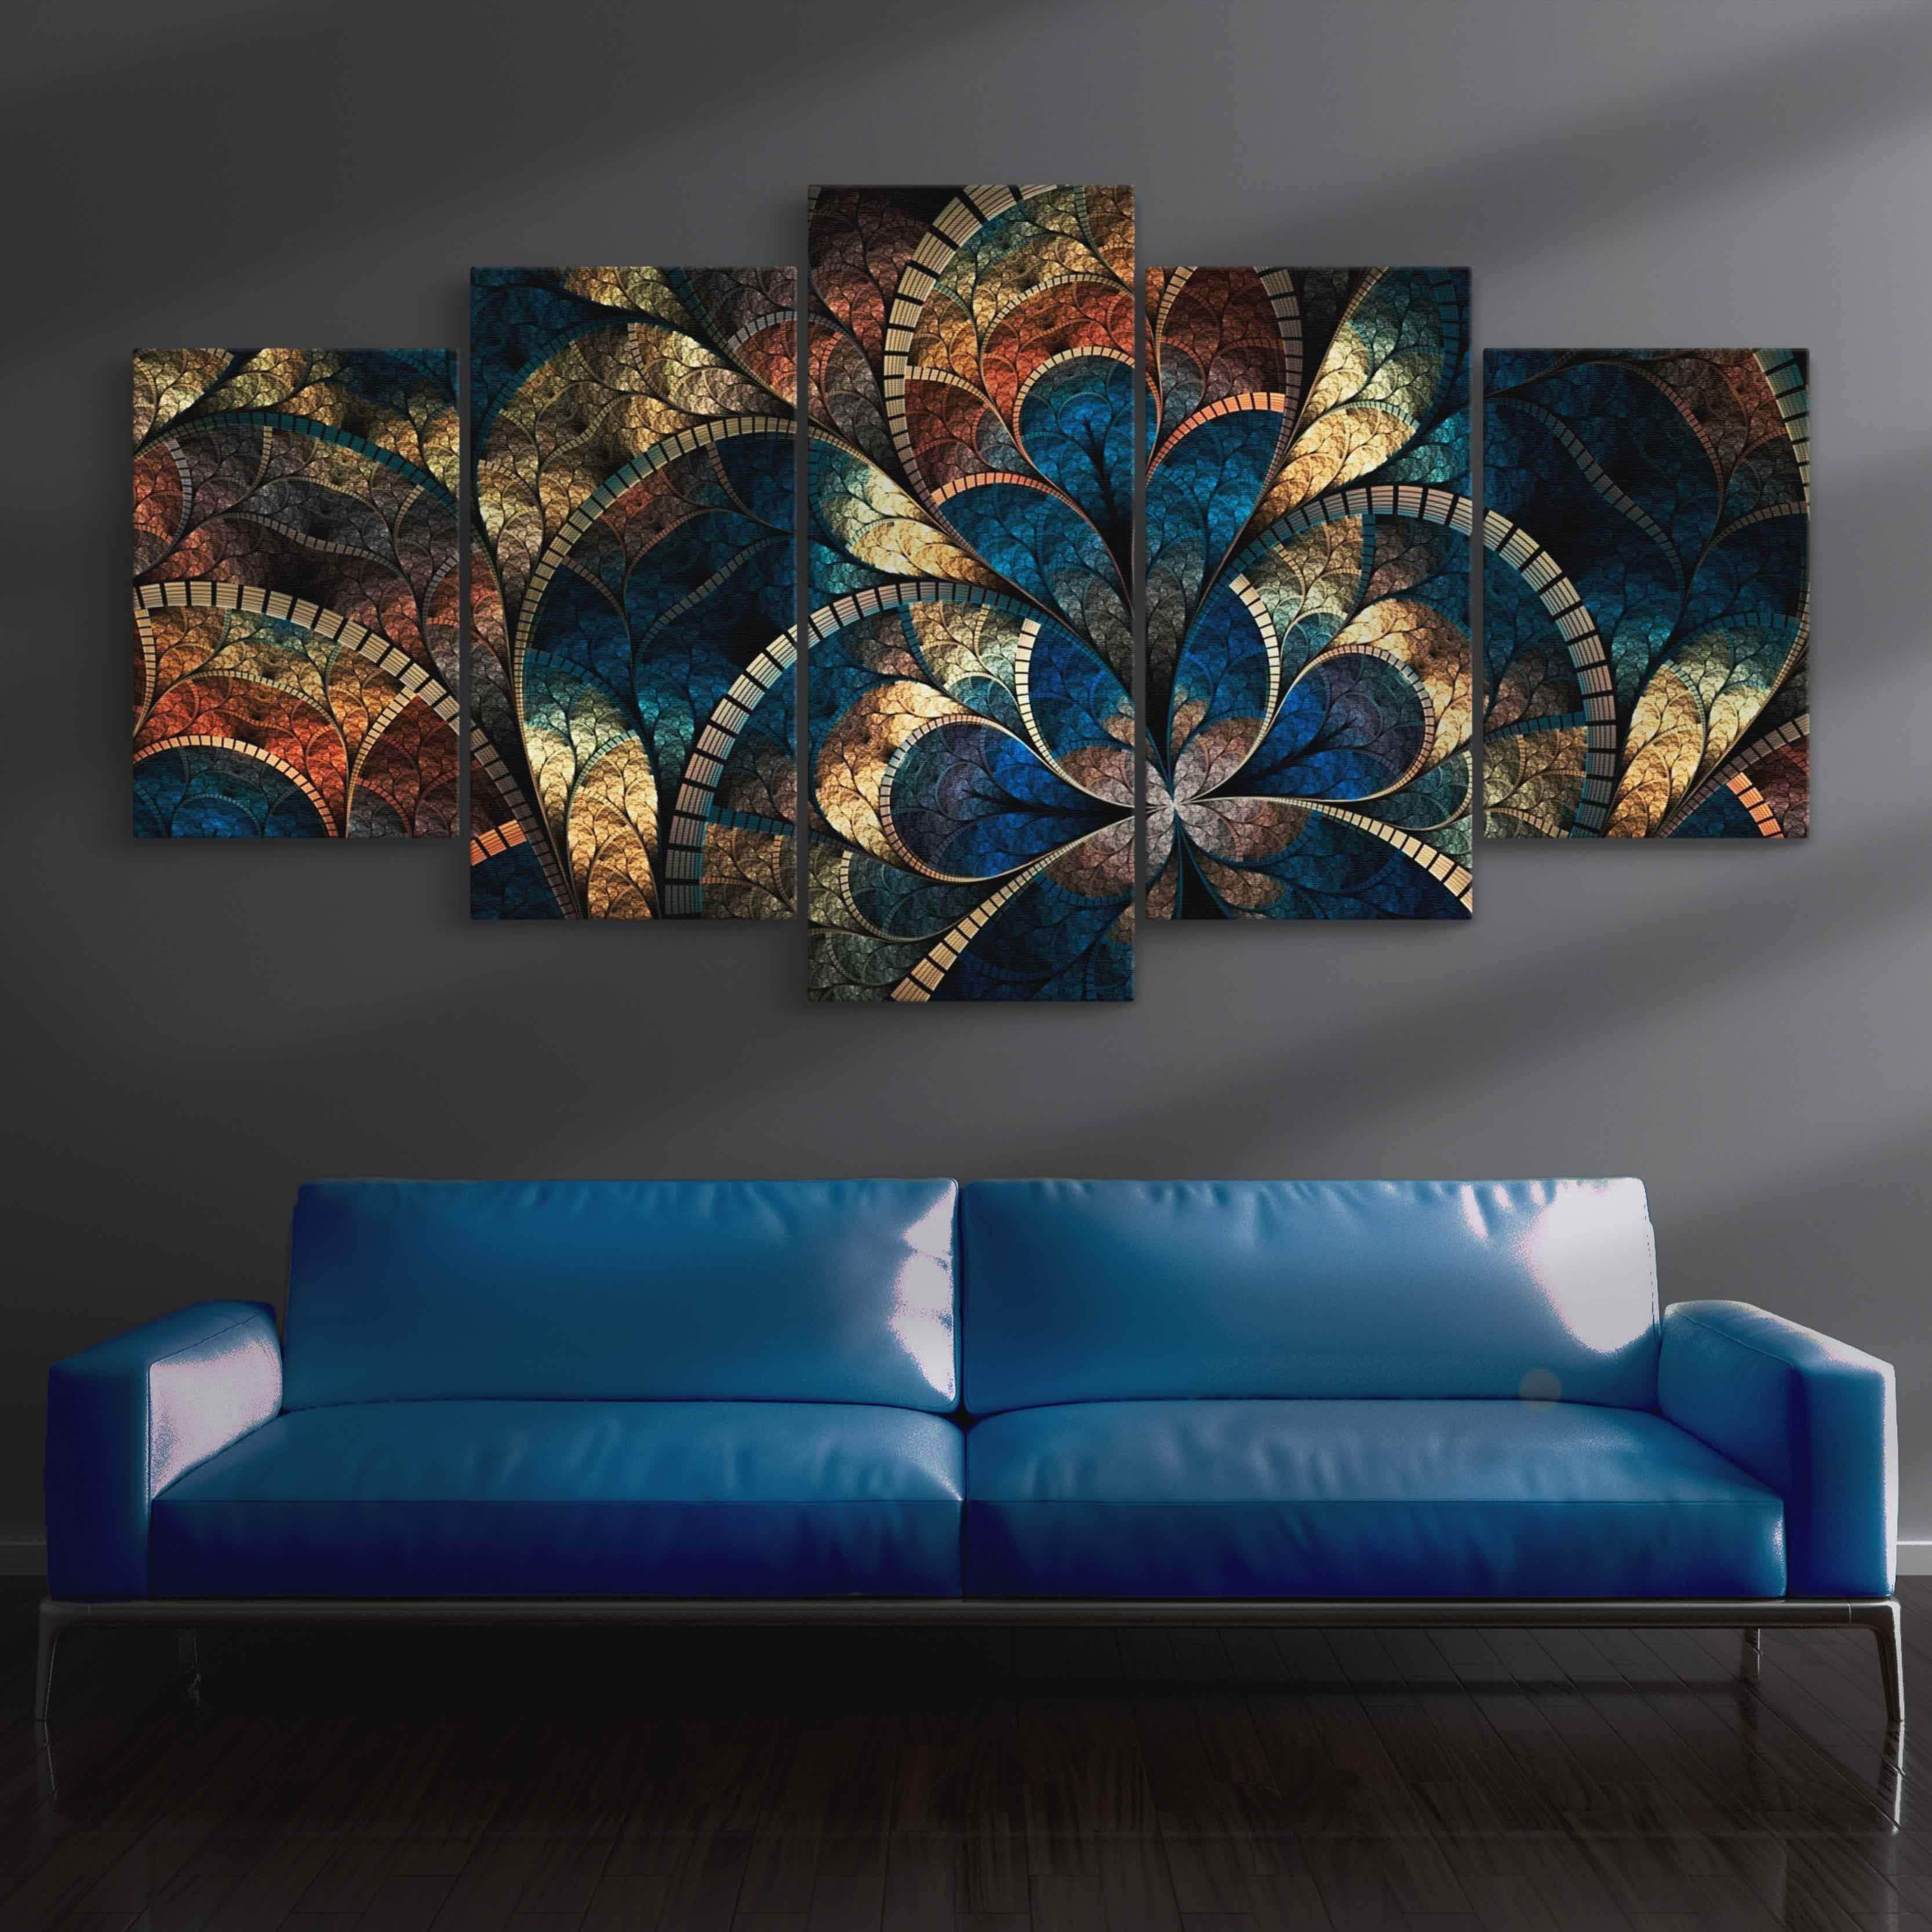 5P Canvas Abstract Art Canvas 5 panel wall art canvas